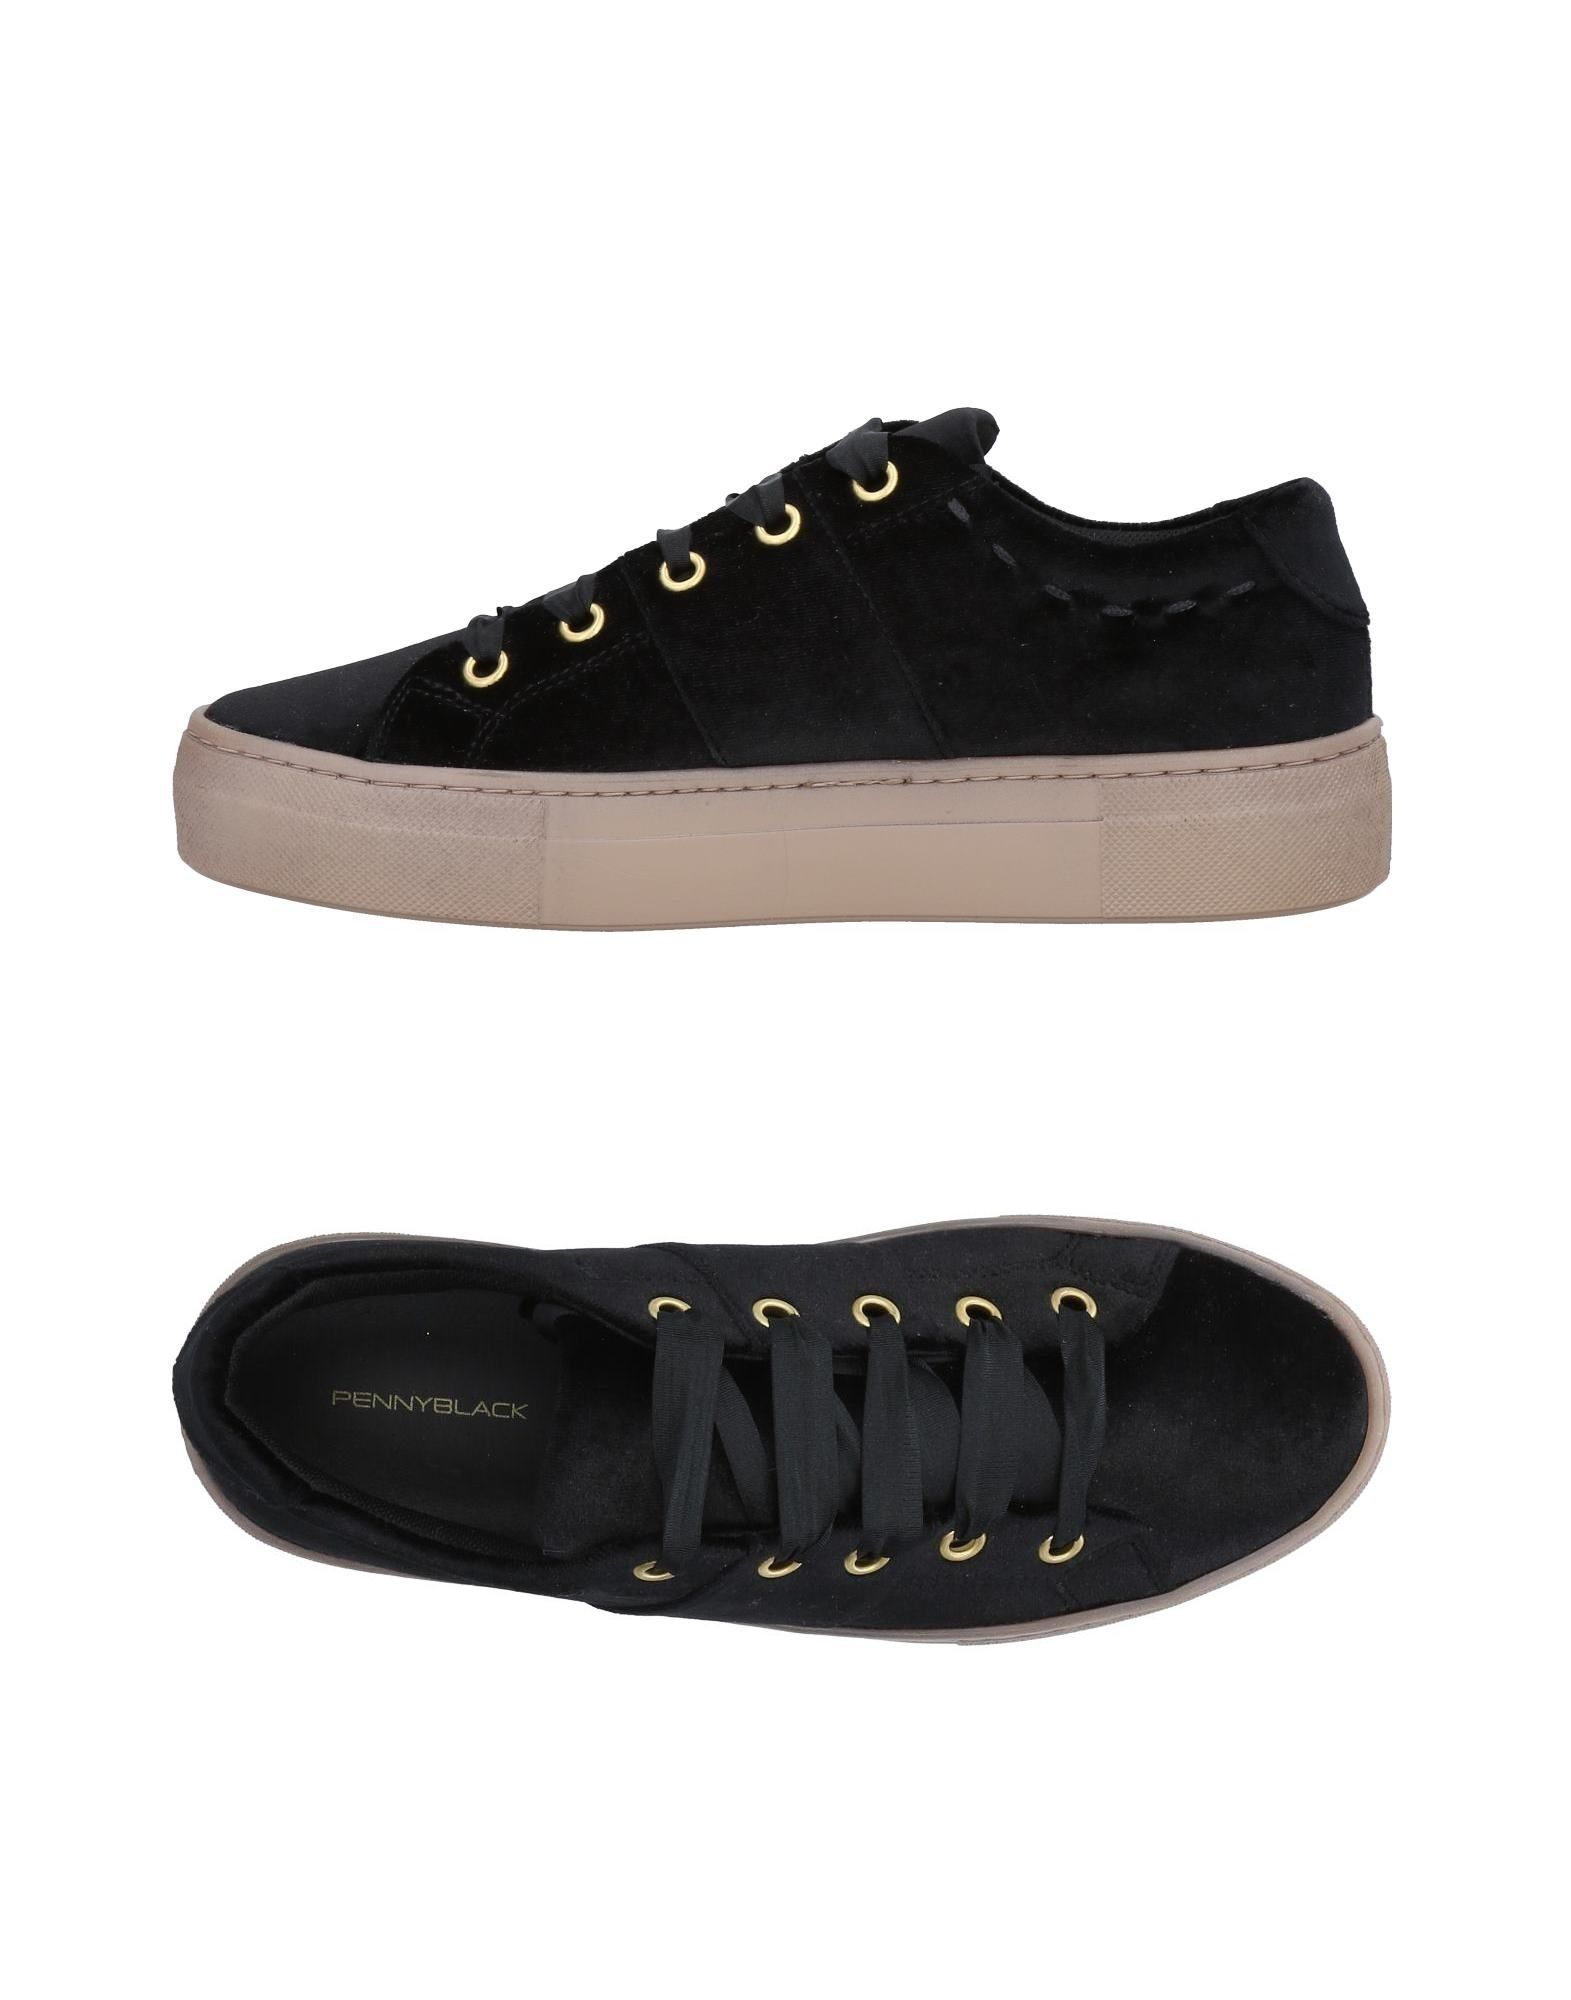 Sneakers Pennyblack Donna comode - 11486690OH Scarpe comode Donna e distintive 6b3ea5